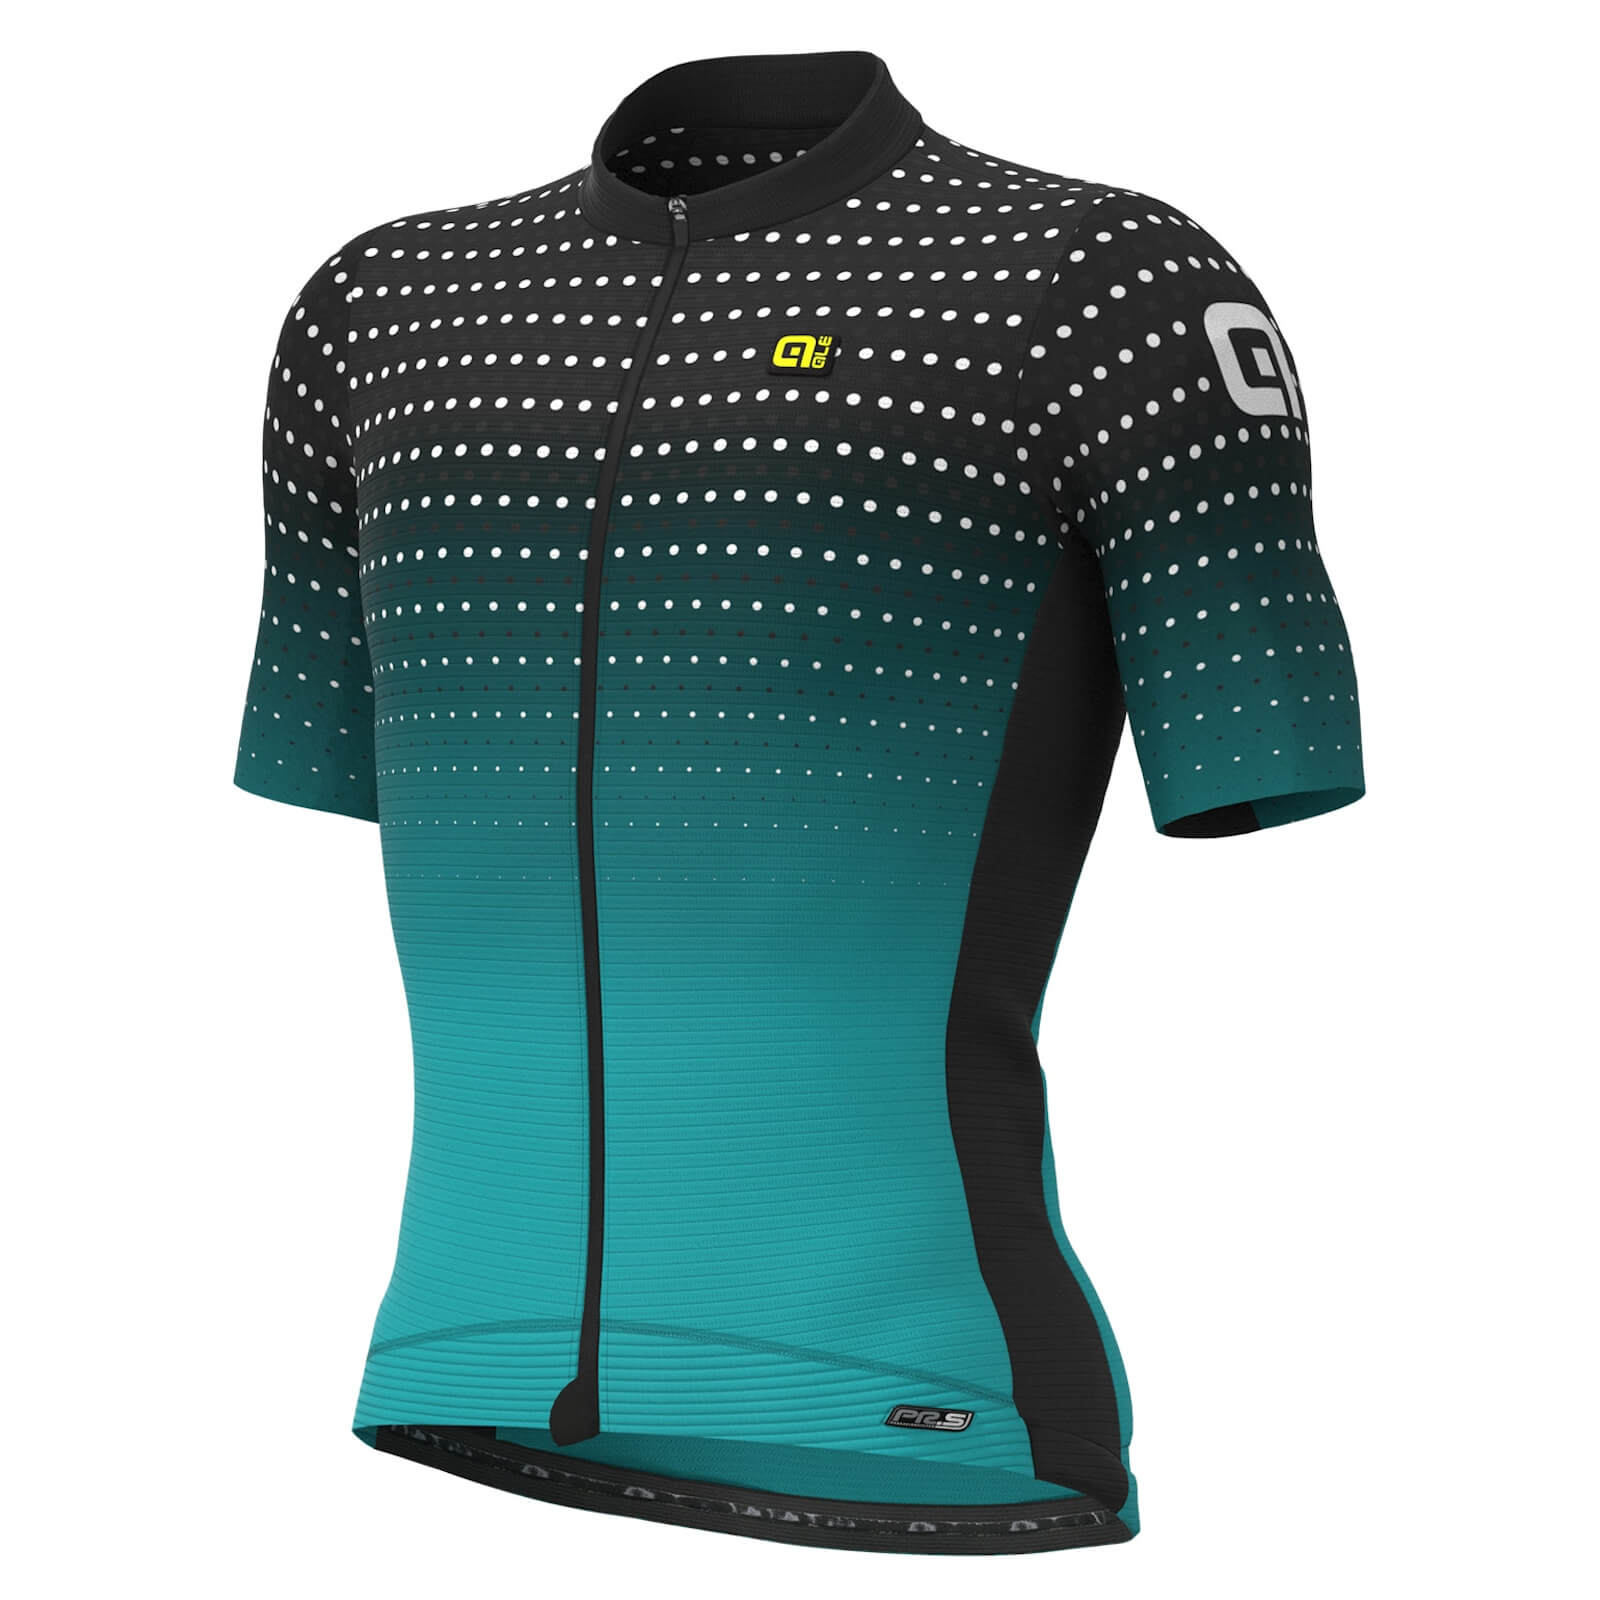 Ale PR-S Bullett Jersey - XL - Black/Aqua